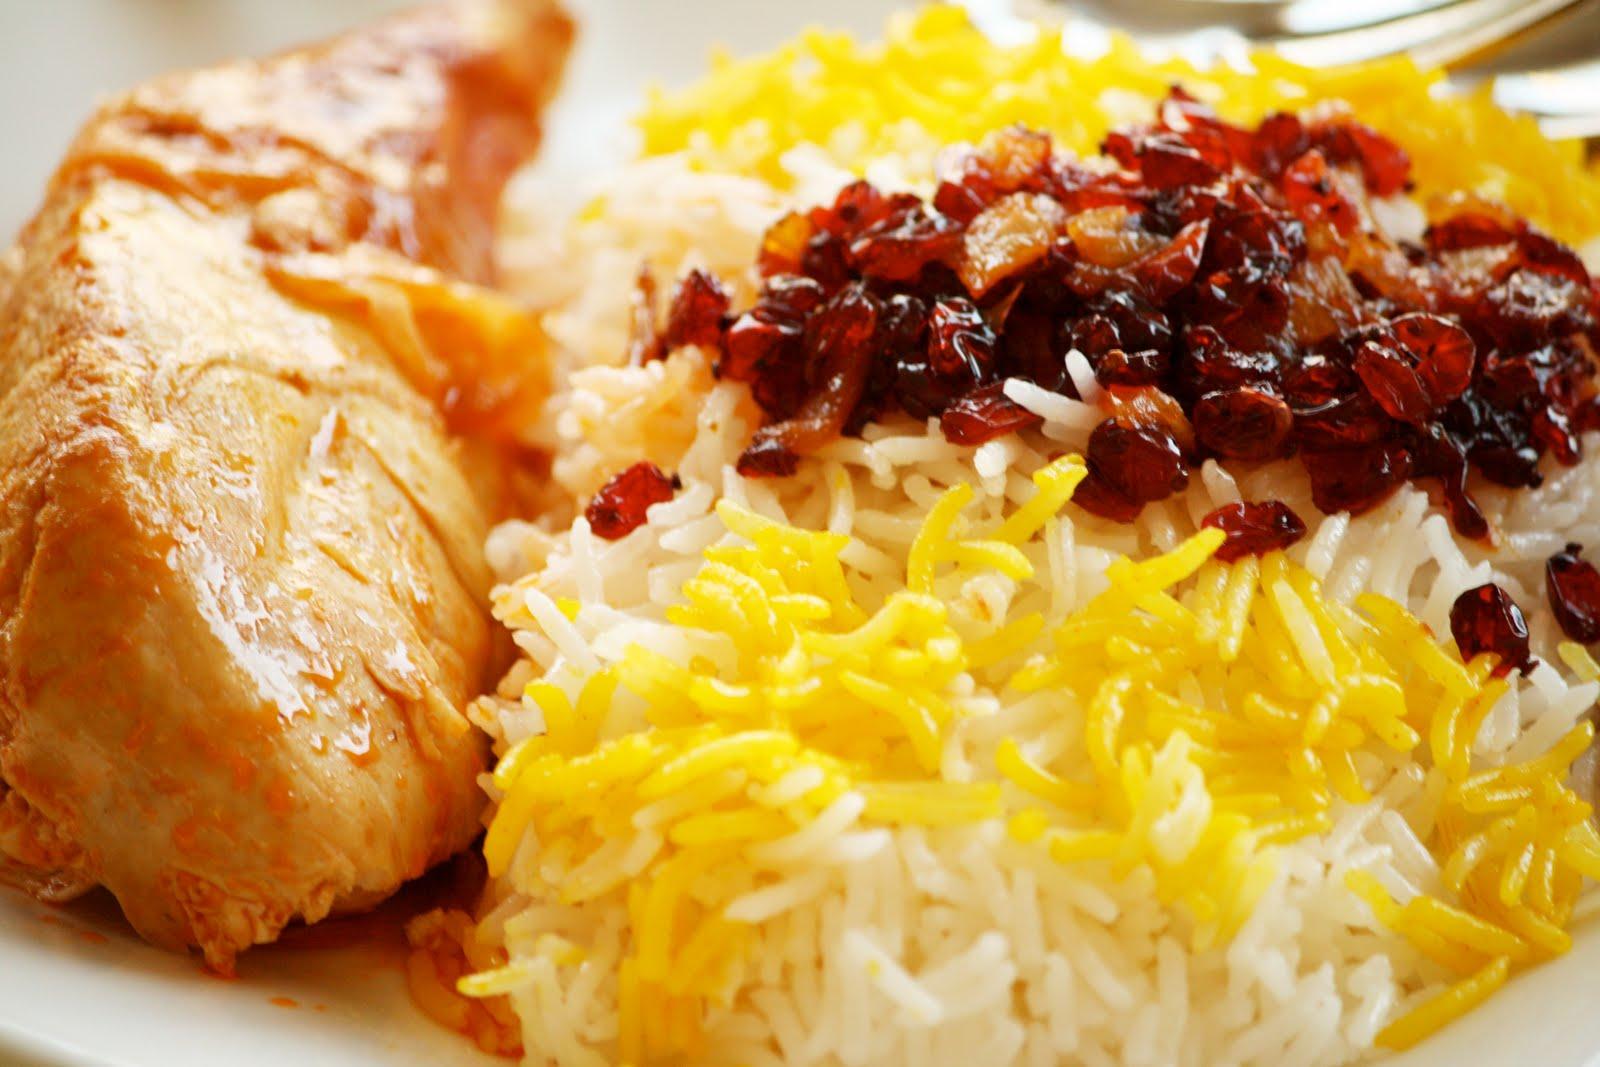 Edible moments persian cuisine part 1 zereshk polo o morgh persian cuisine part 1 zereshk polo o morgh forumfinder Images